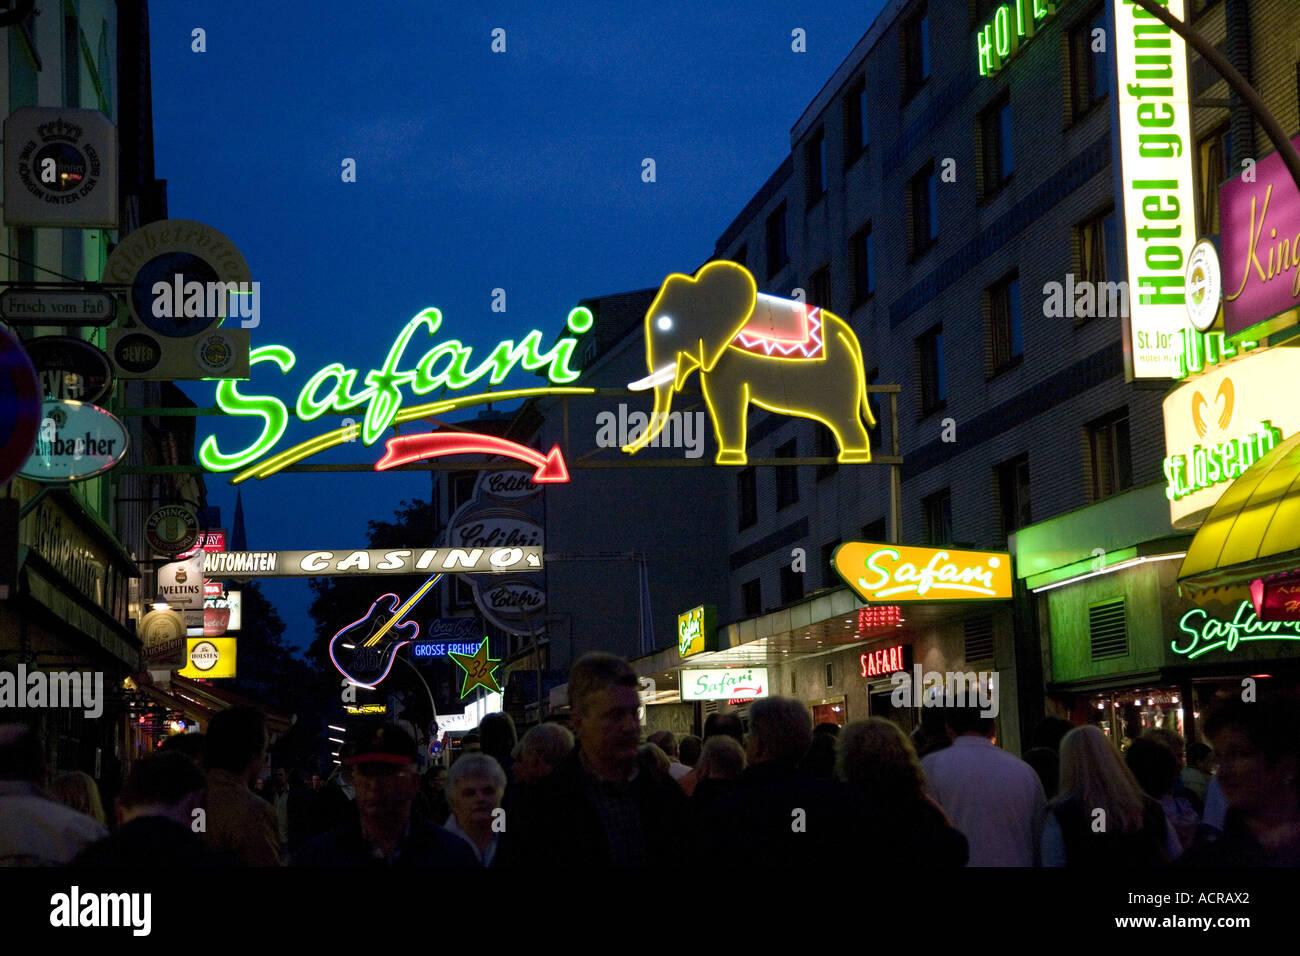 Safari St Pauli